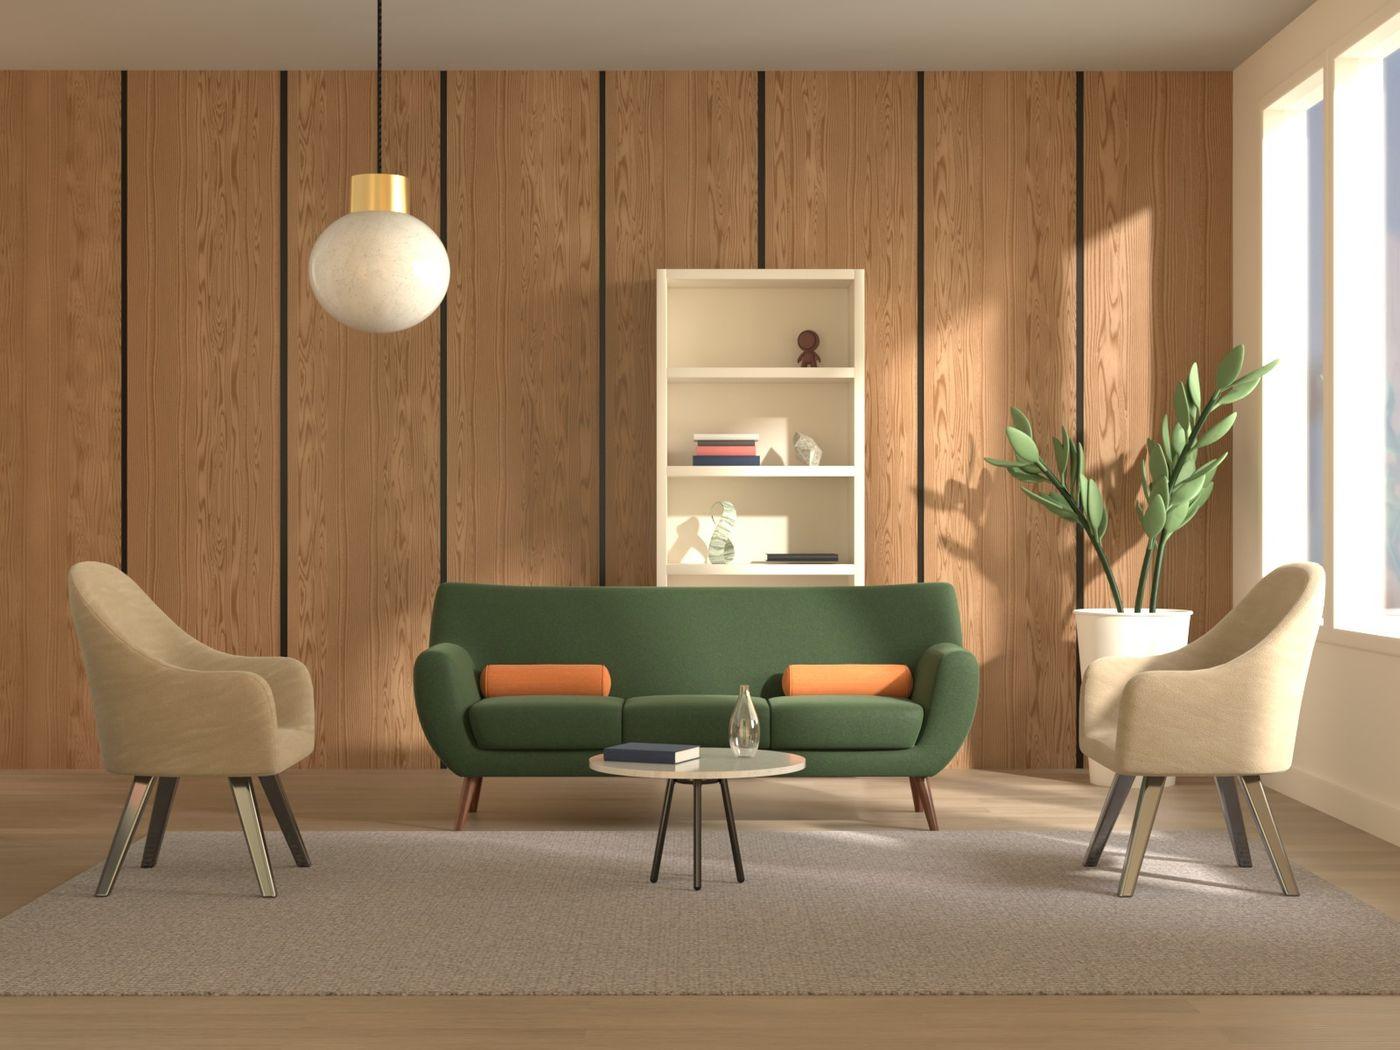 Adobe Substance 3D - Living Room